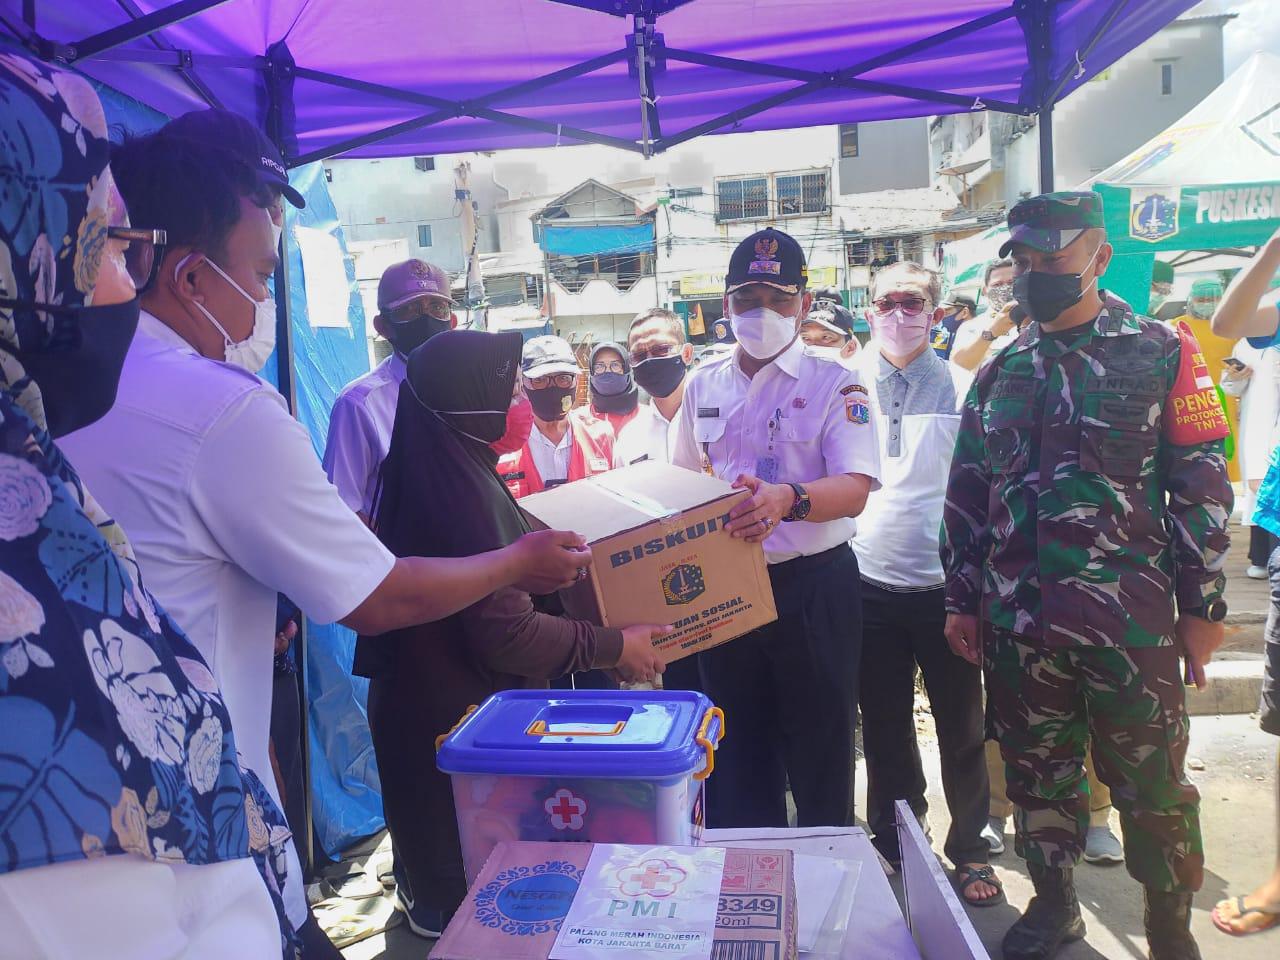 Dandim 0503/JB Bersama Walikota dan Kapolres Jakbar Bantu Korban Kebakaran